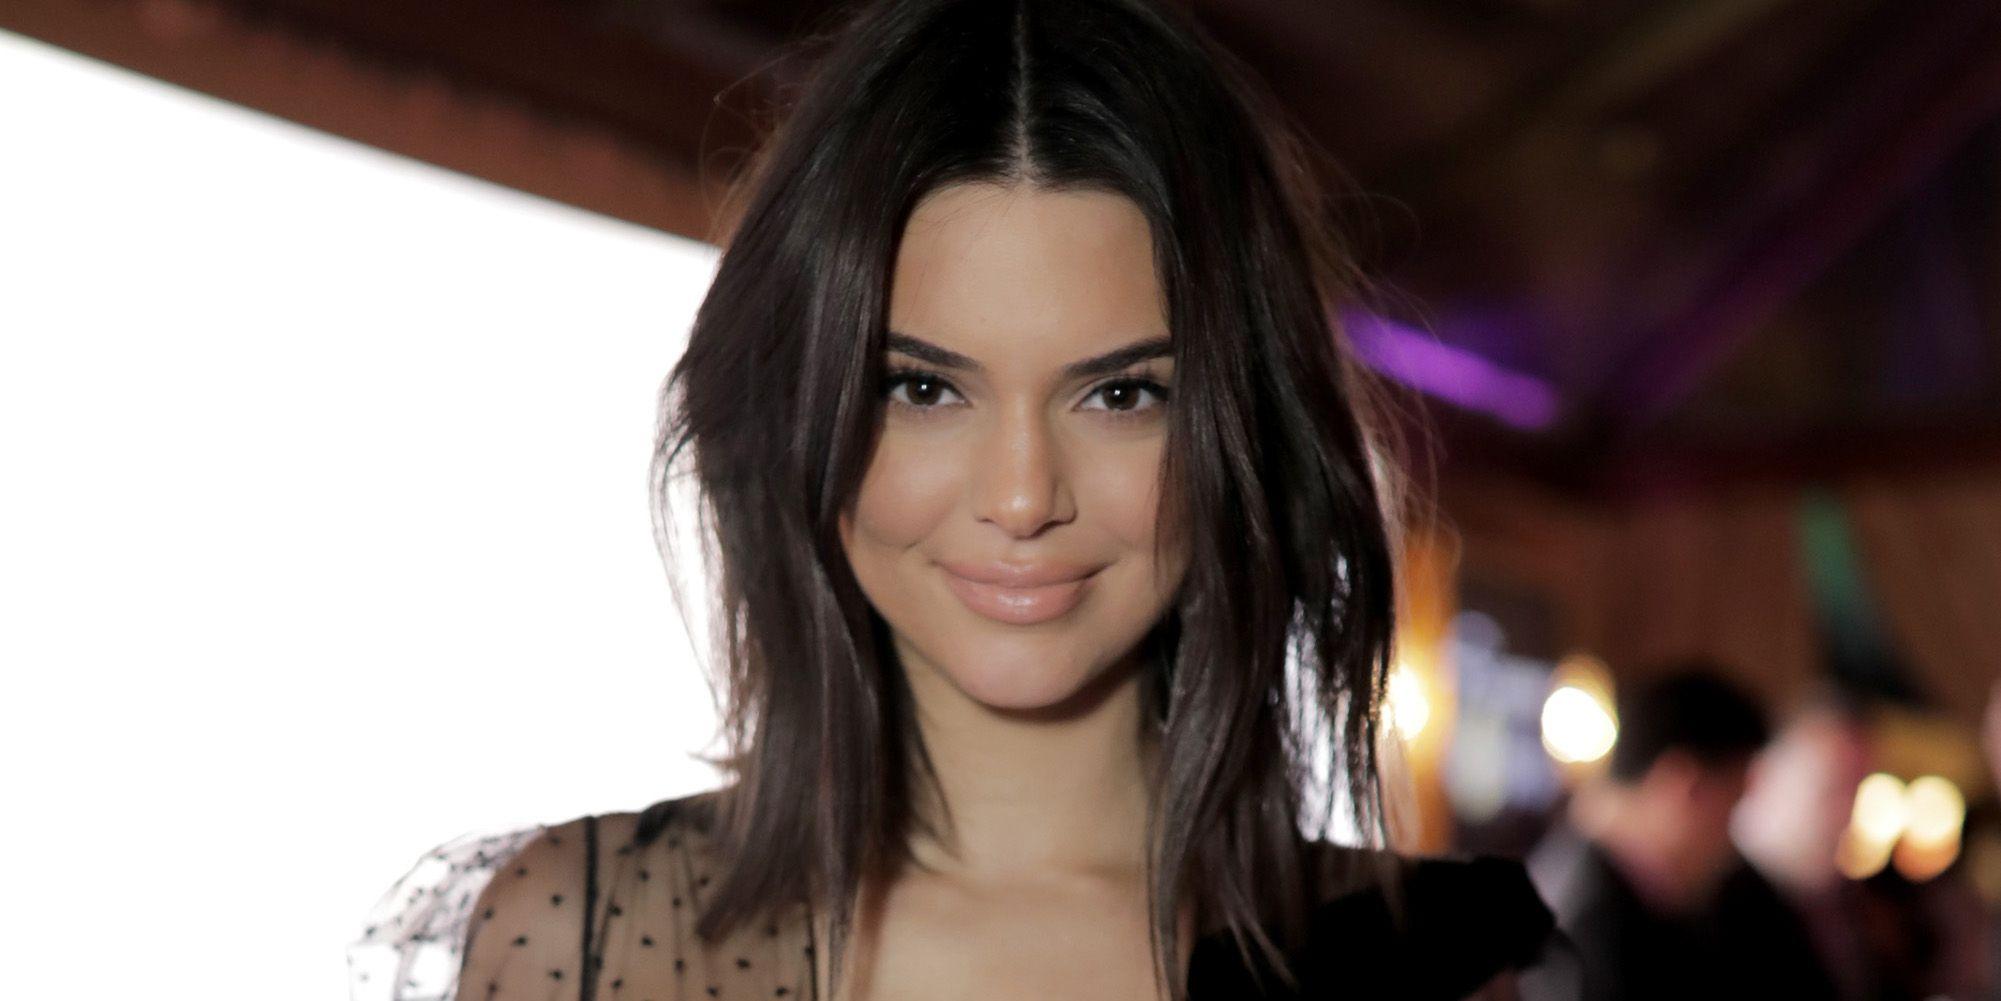 Leaked:Kendall Jenner Nude